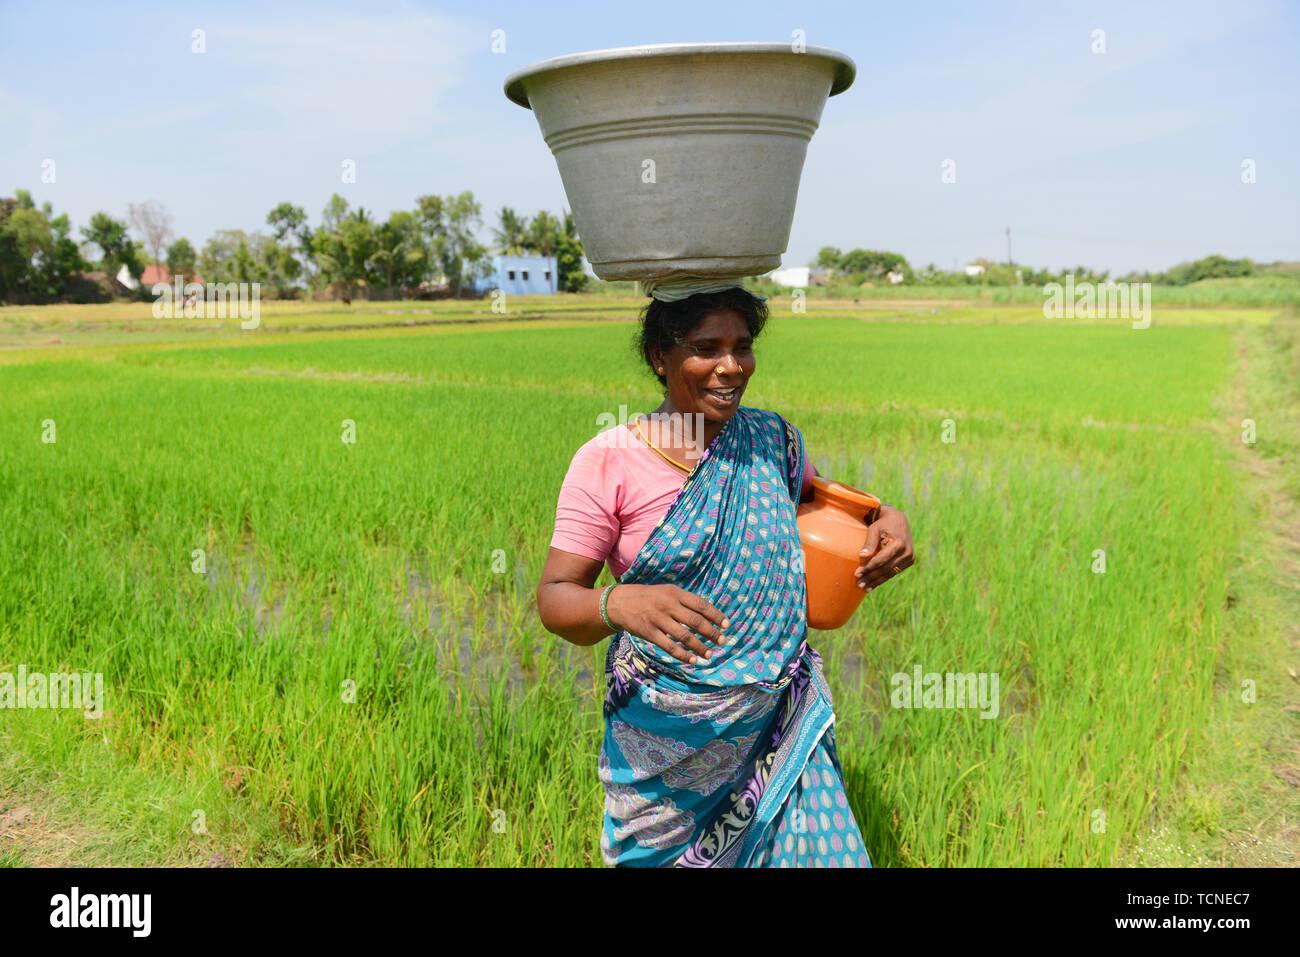 Tamil Woman Stock Photos & Tamil Woman Stock Images - Alamy